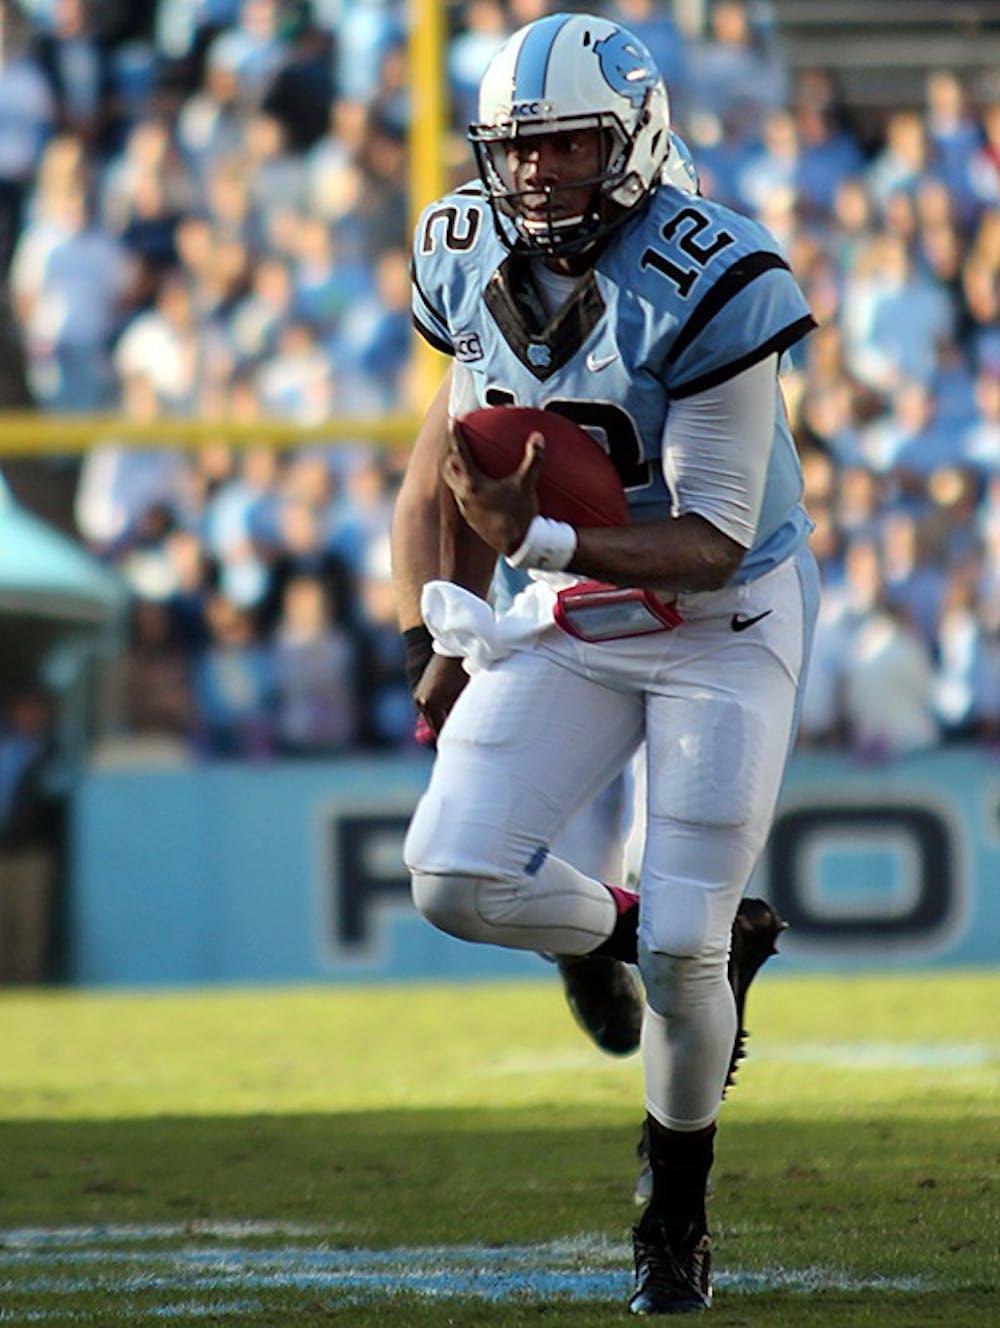 North Carolina football team springs into practice - The ...North Carolina Football Roster